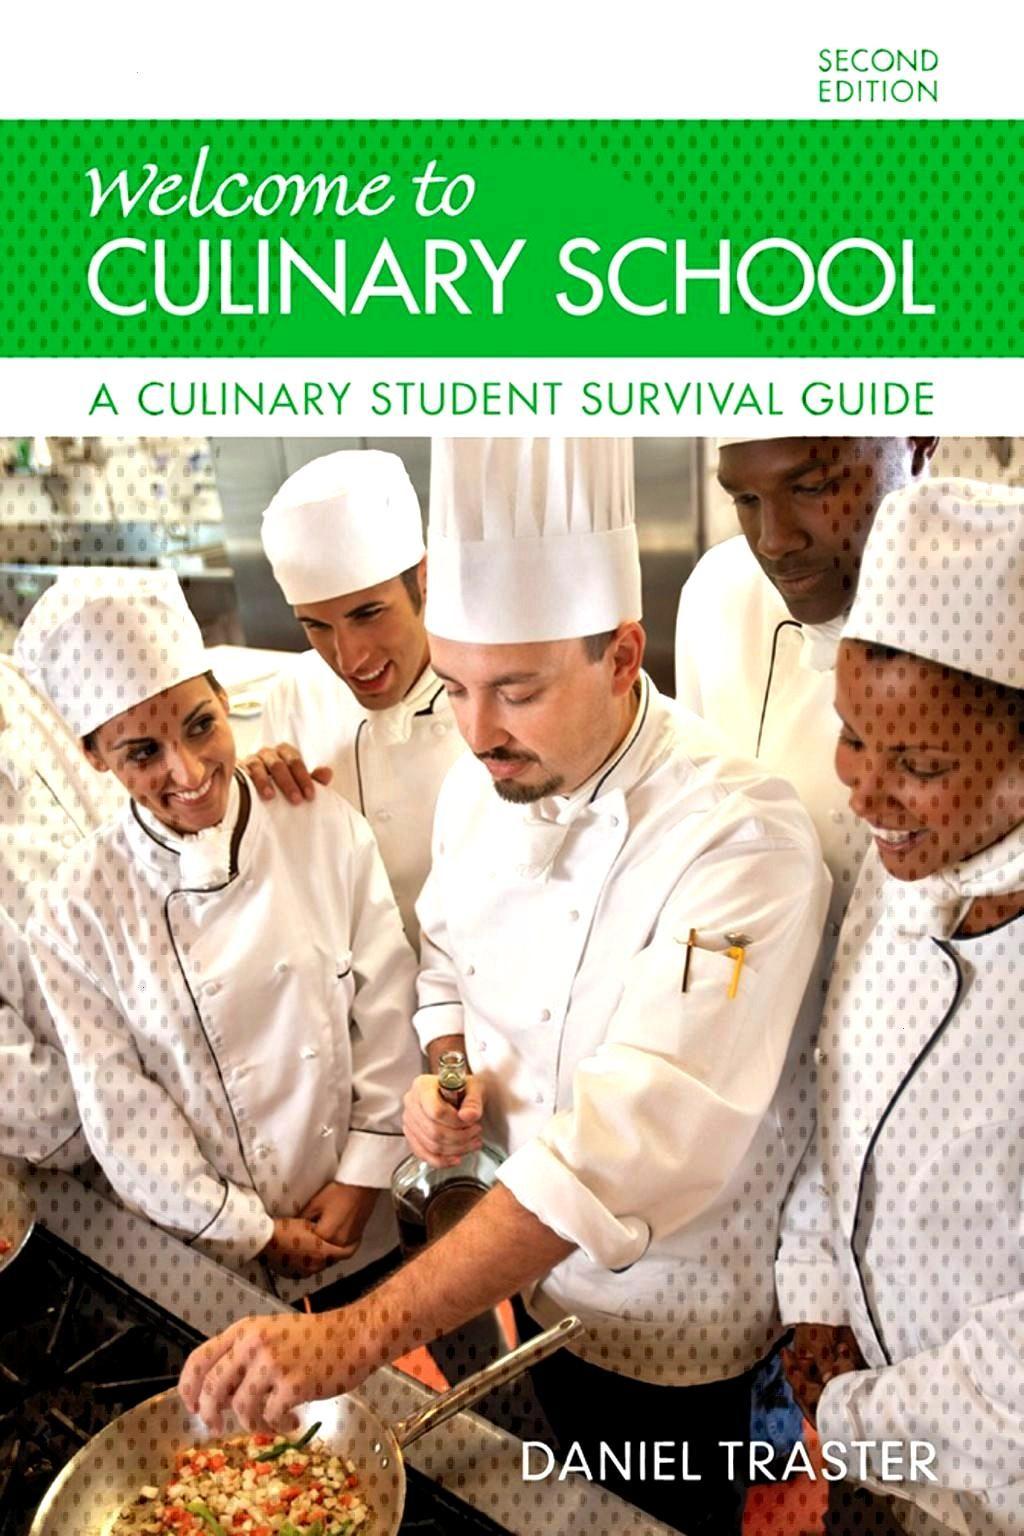 Culinary Welcome School Rental Ebook To Welcome To Culinary School Ebook Rental You Can Find Culinary Sch Culinary School School Metric Conversion Chart